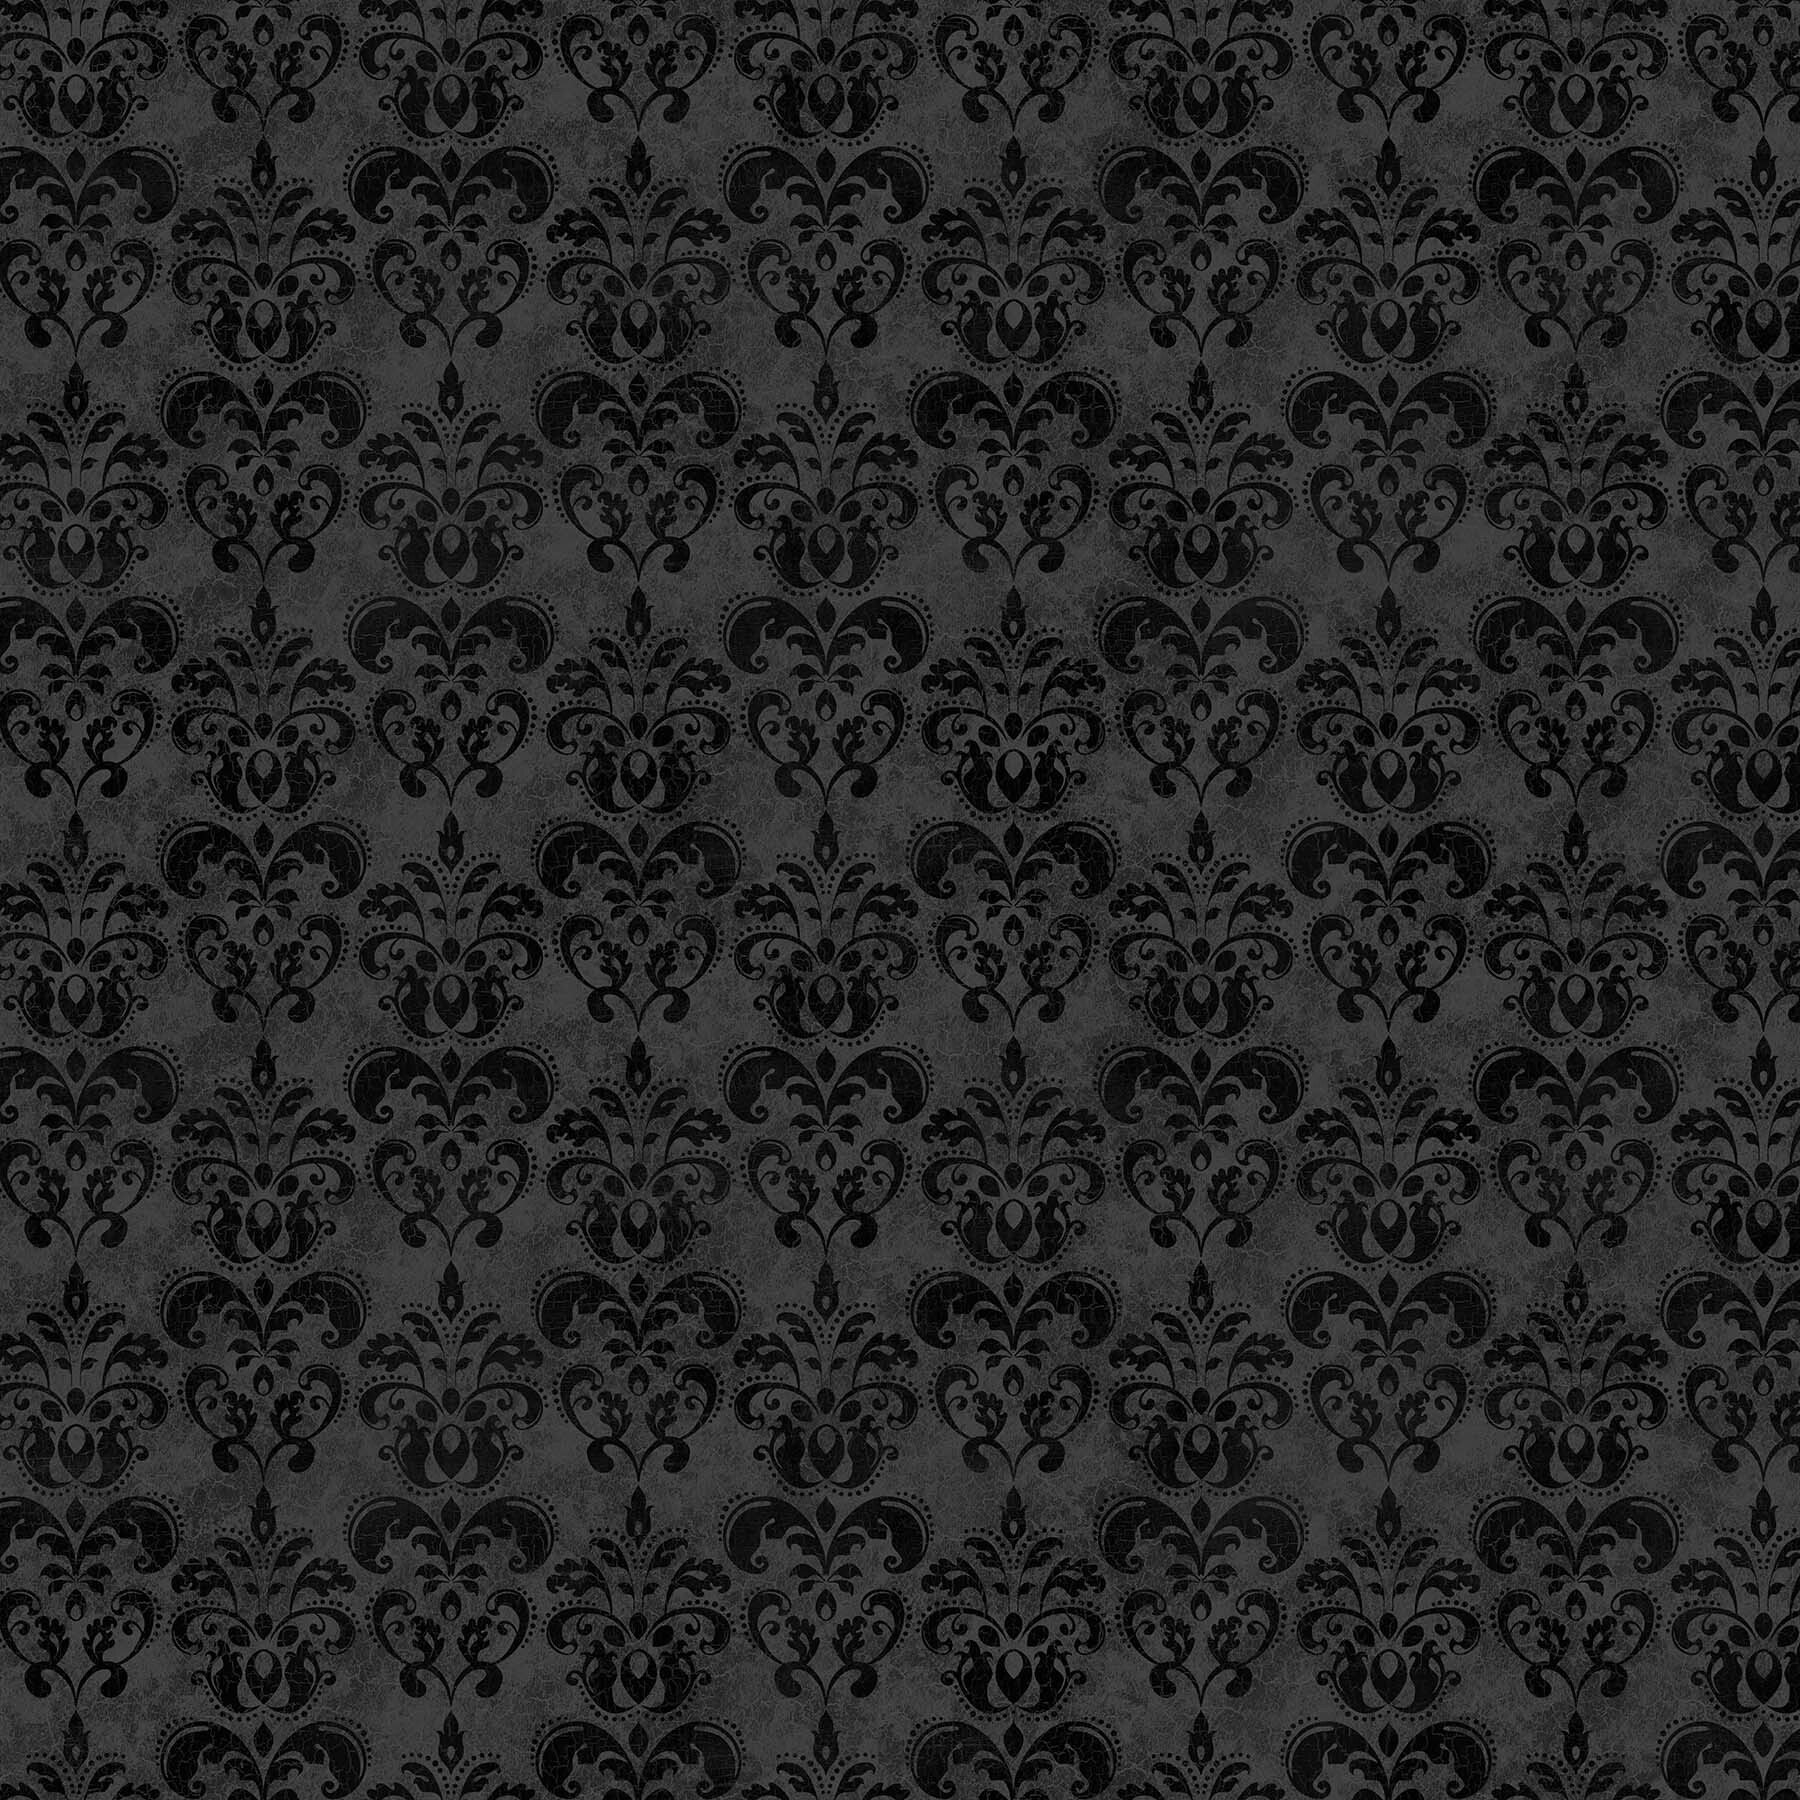 Black Cat Capers - Black Filigree - 1/2m cut 57891